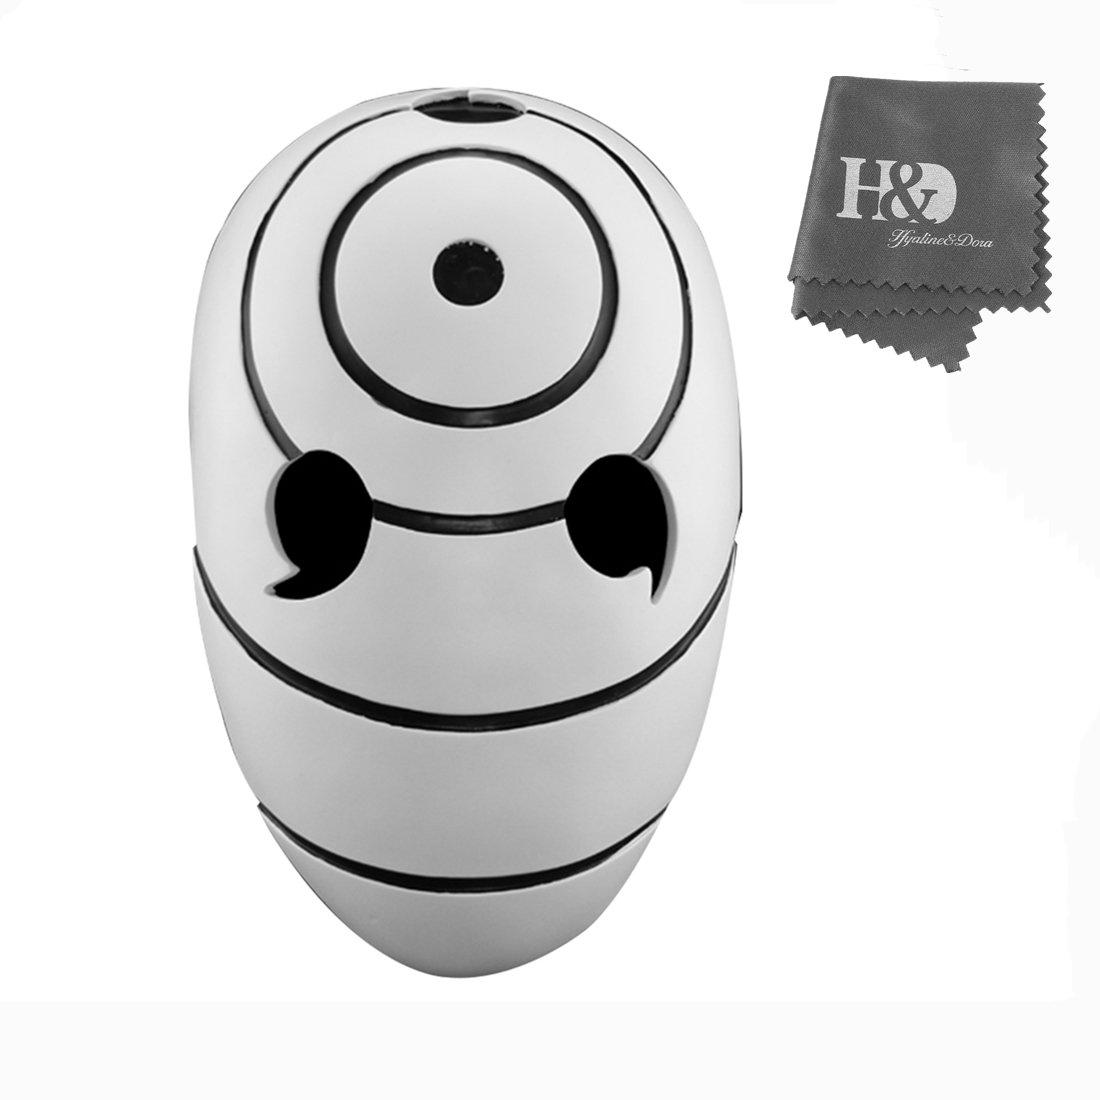 YUFENG Resin Halloween Collector Masks Masquerade Ball Face Mask Adult Party Cosplay Props Resin Tobi Obito Naruto Uchiha (uchiha zone mask) by YUFENG